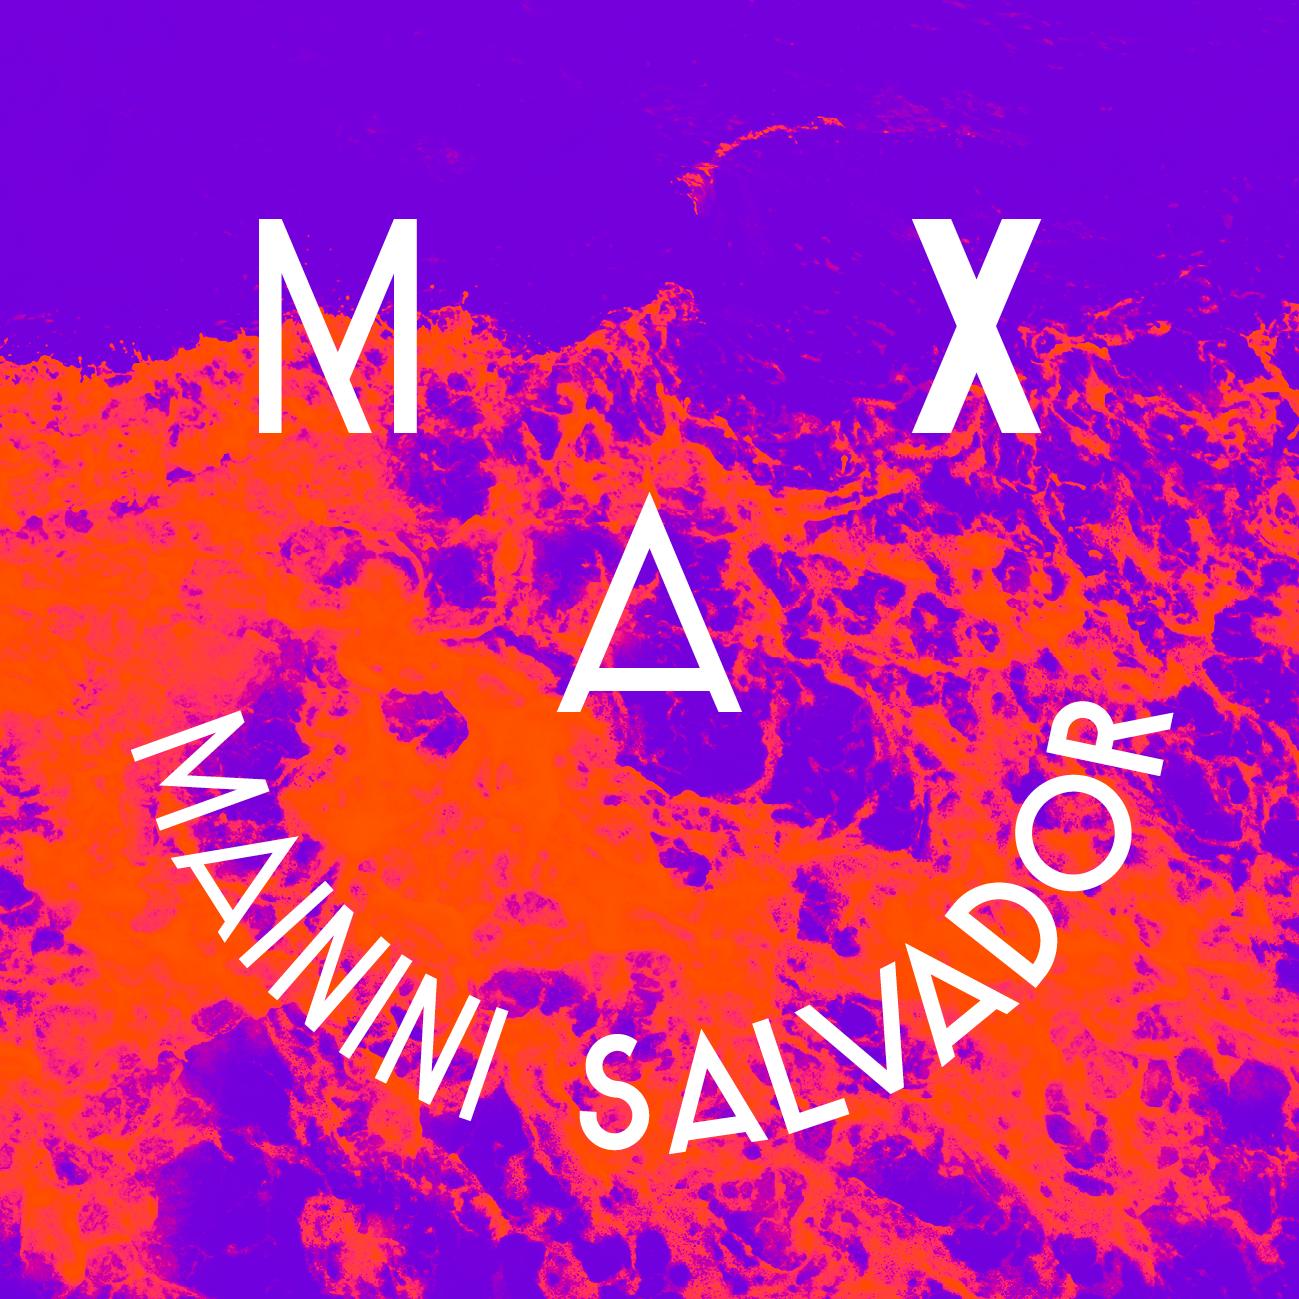 Max Mainini Salvador